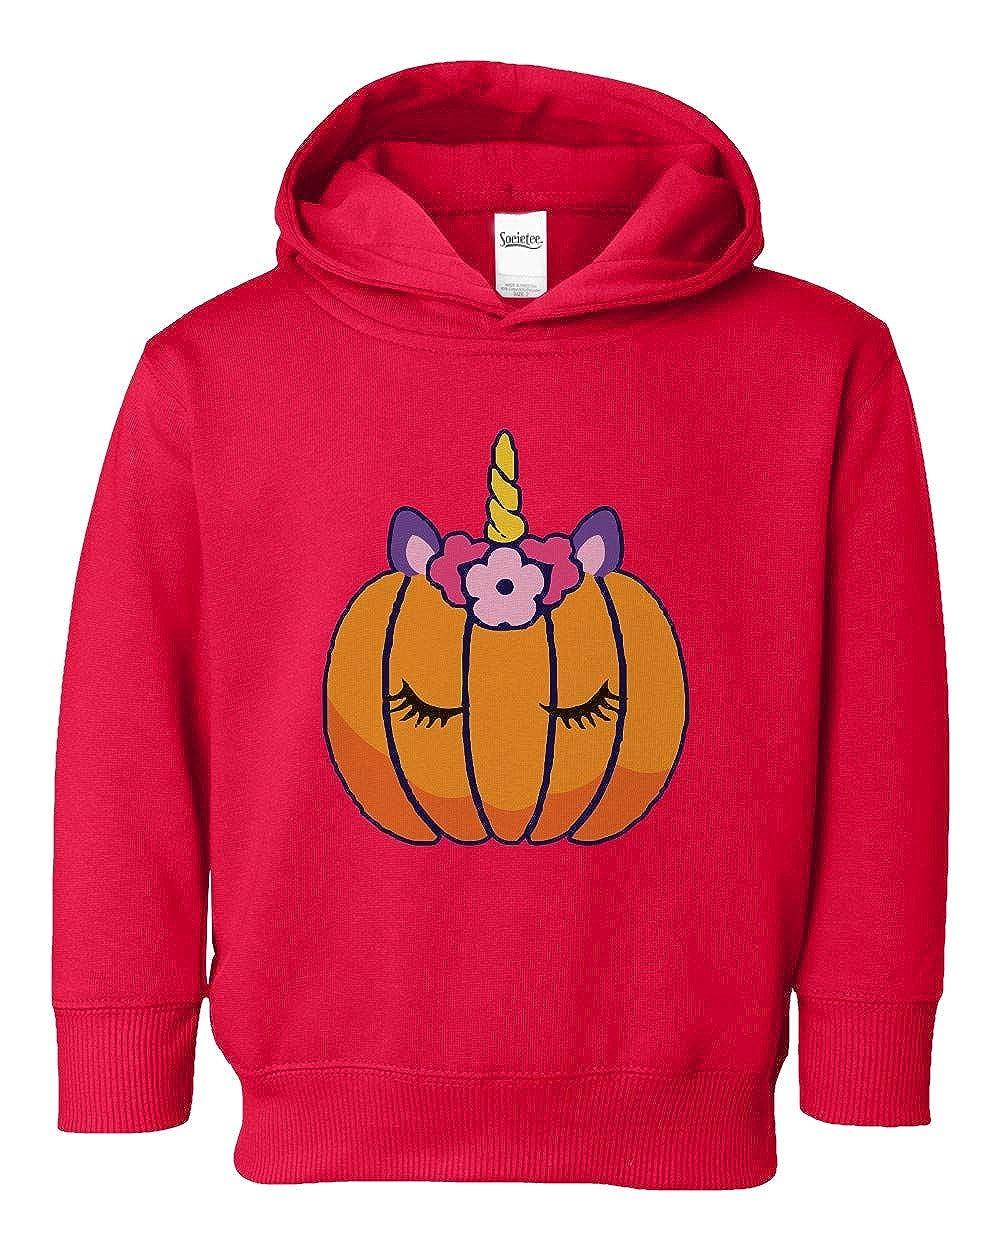 Societee Unicorn Pumpkin Cute Girls Toddler Hooded Sweatshirt